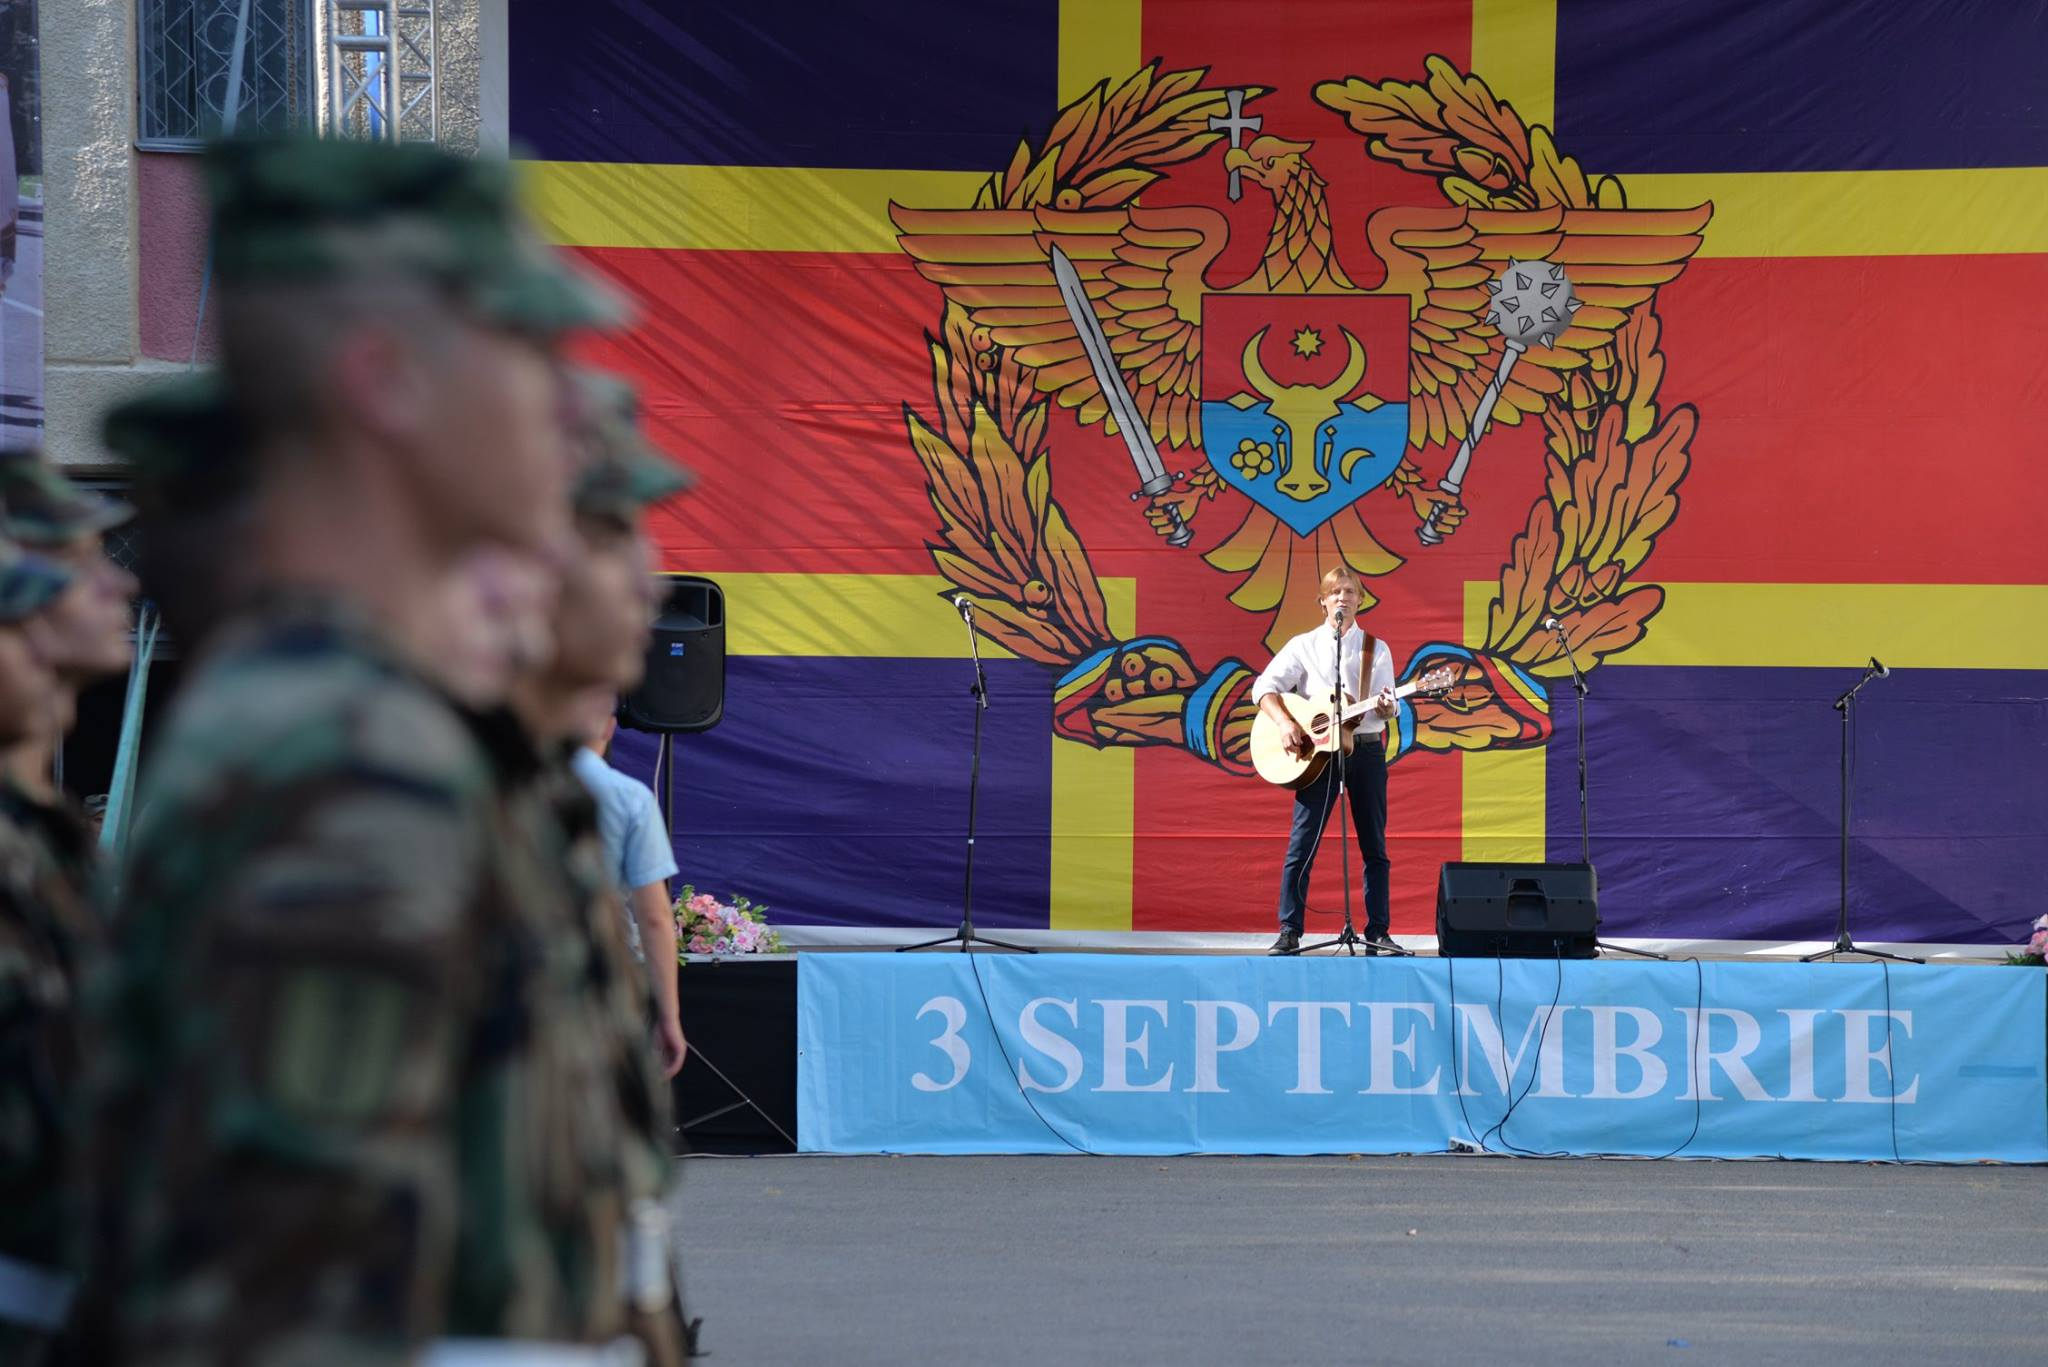 armata rm, ostașii moldoveni Ziua Armatei Naționale, eugen sturza, guvernul filip, partidul democrat, ma, vlad plahotniuc pdm, reforma armatei moldova